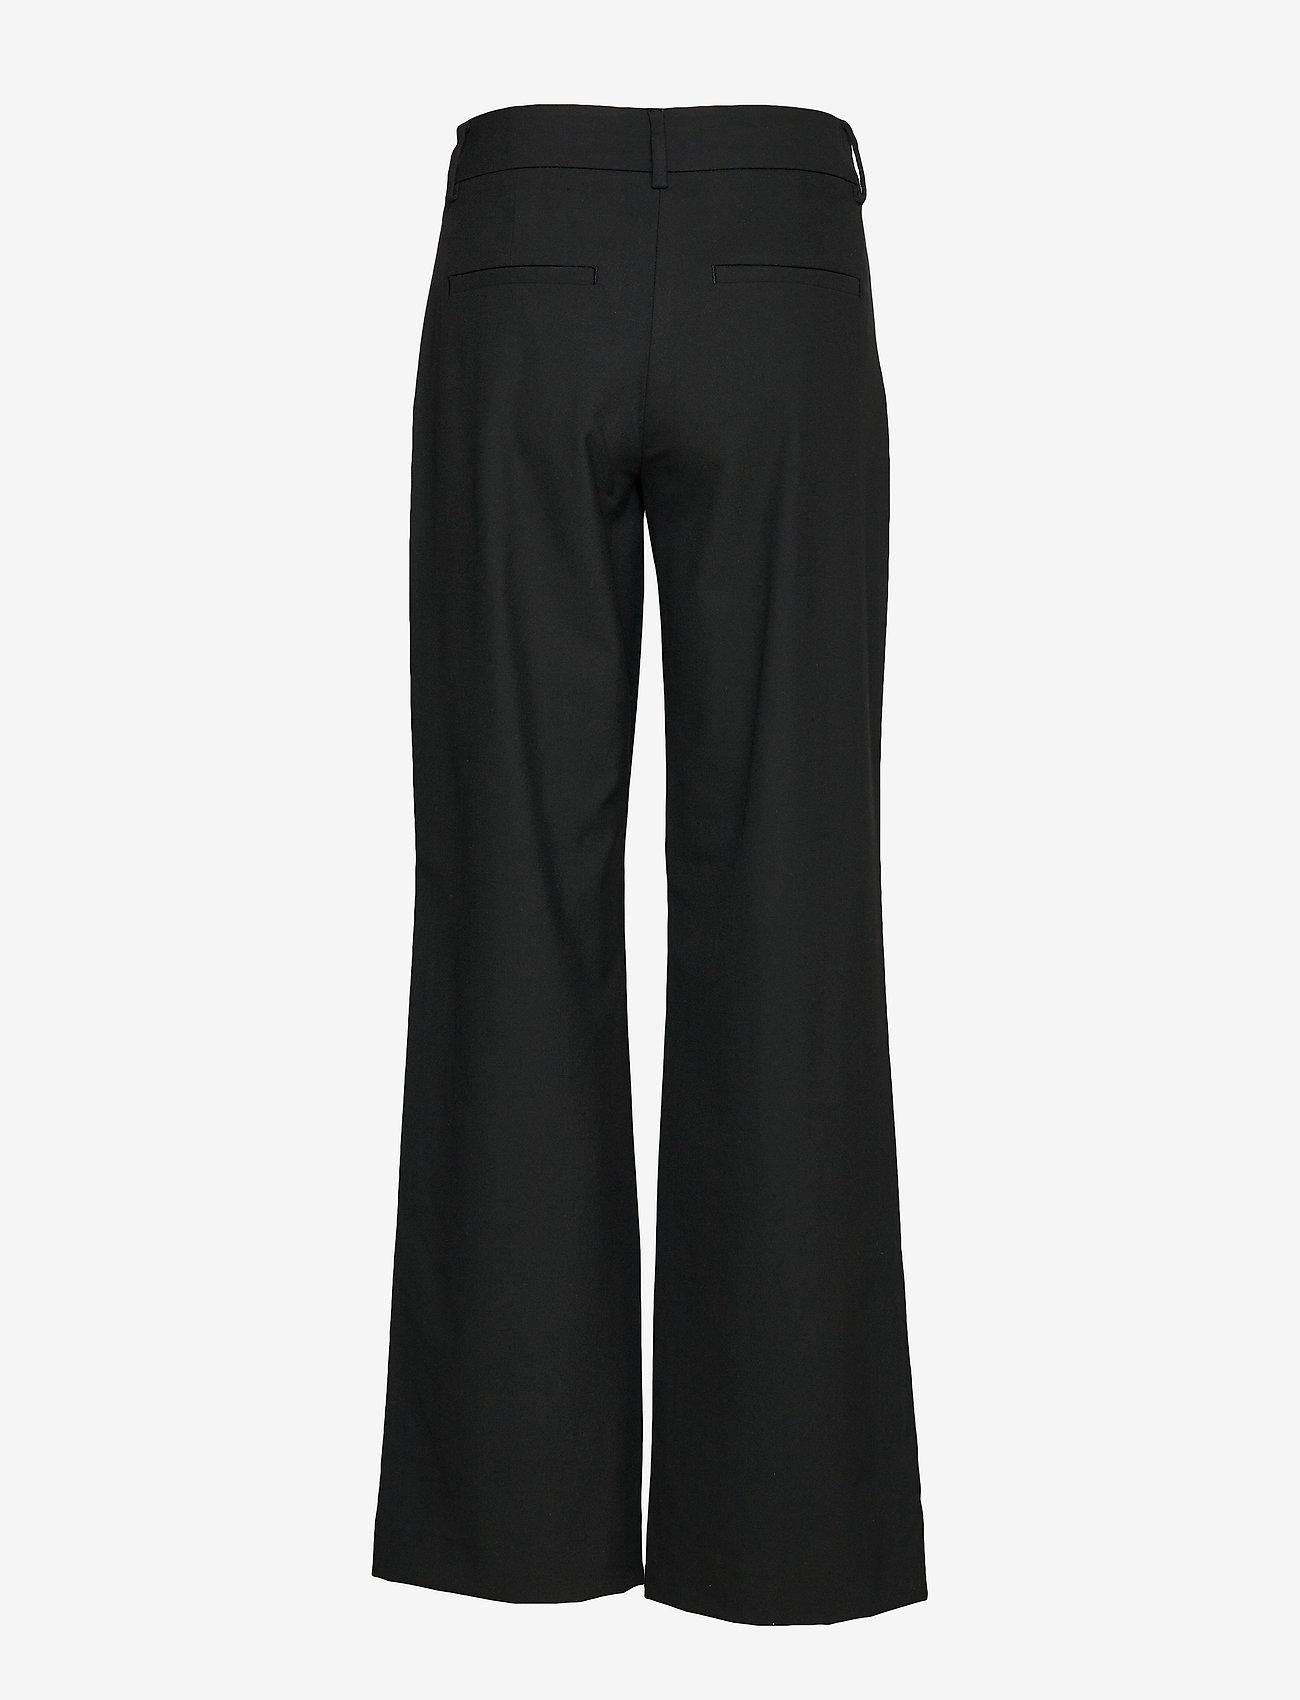 FIVEUNITS - Dena 285 Black Glow - bukser med brede ben - black glow - 1